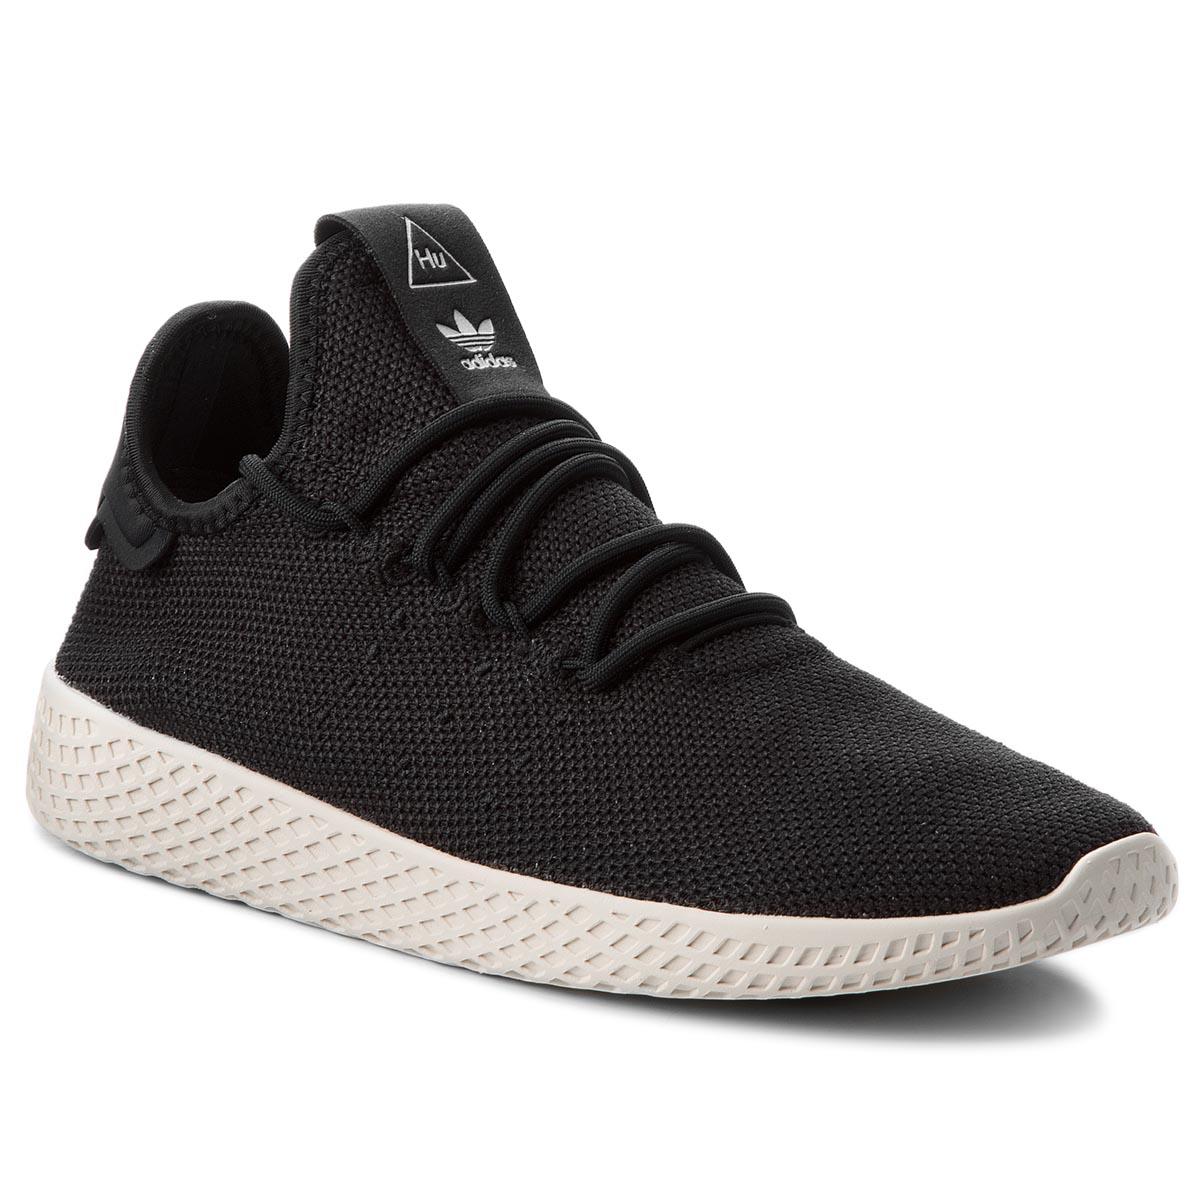 Topánky adidas - Pw Tennis Hu AQ1056  Cblack/Cblack/Cwhite